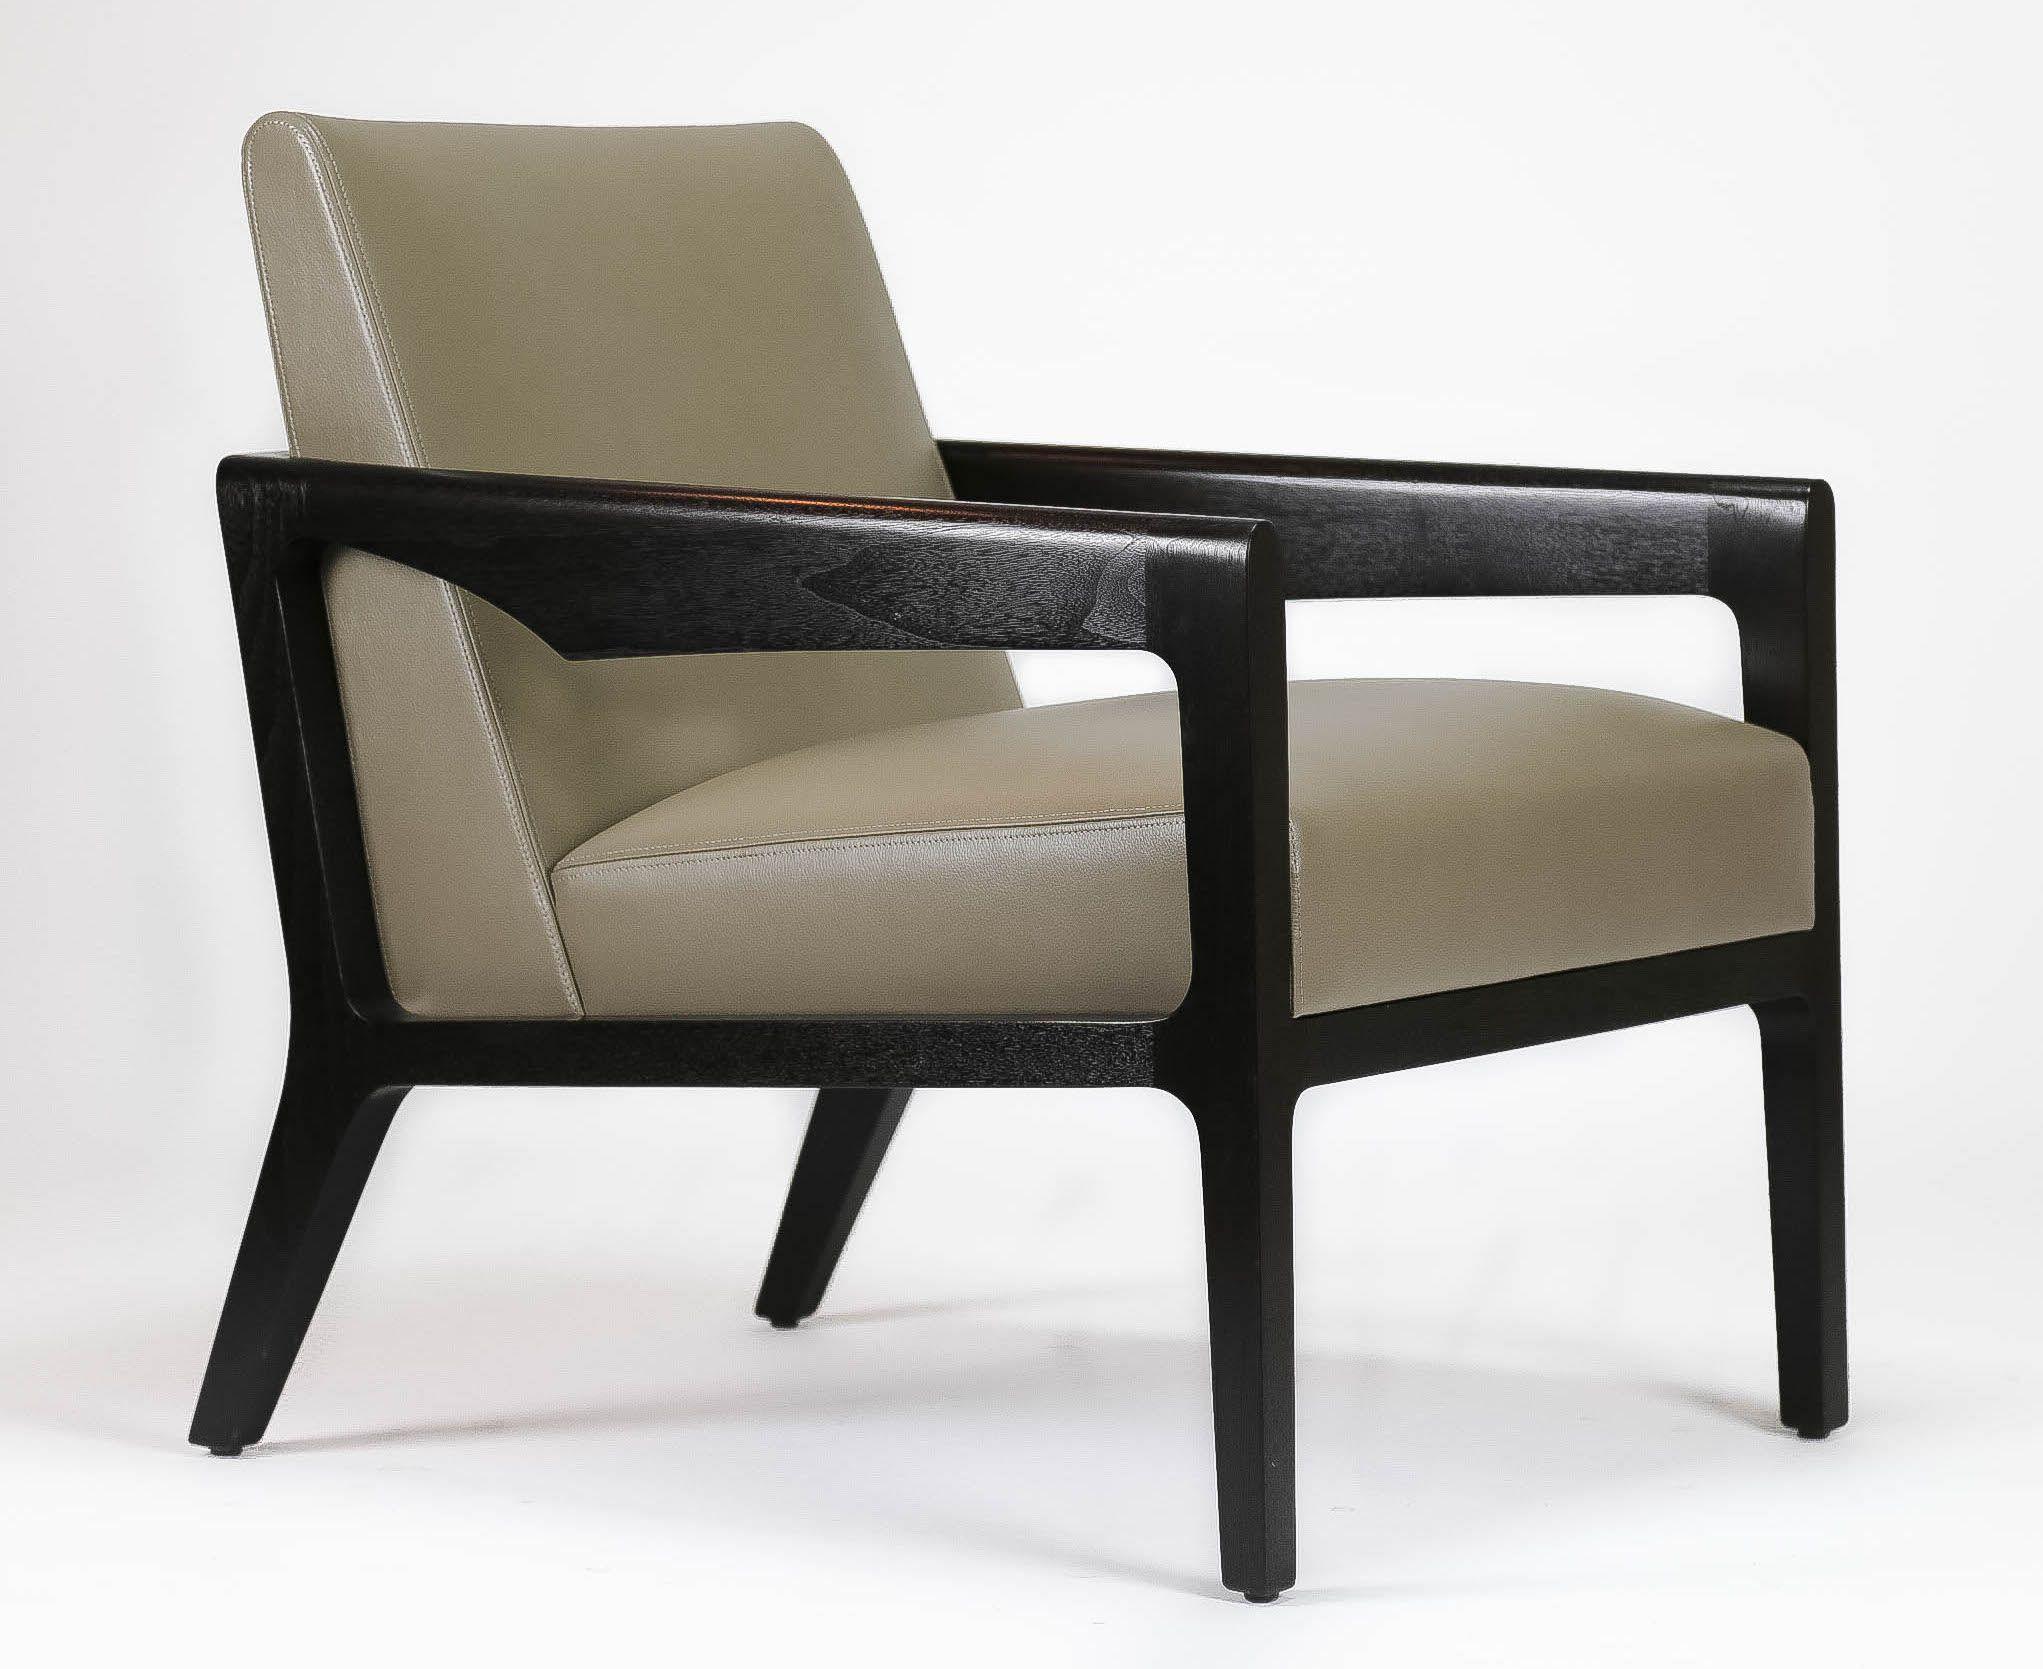 Linea Lounge Chair   S ofa   Pinterest   Sillas, Sillones y Sillas ...